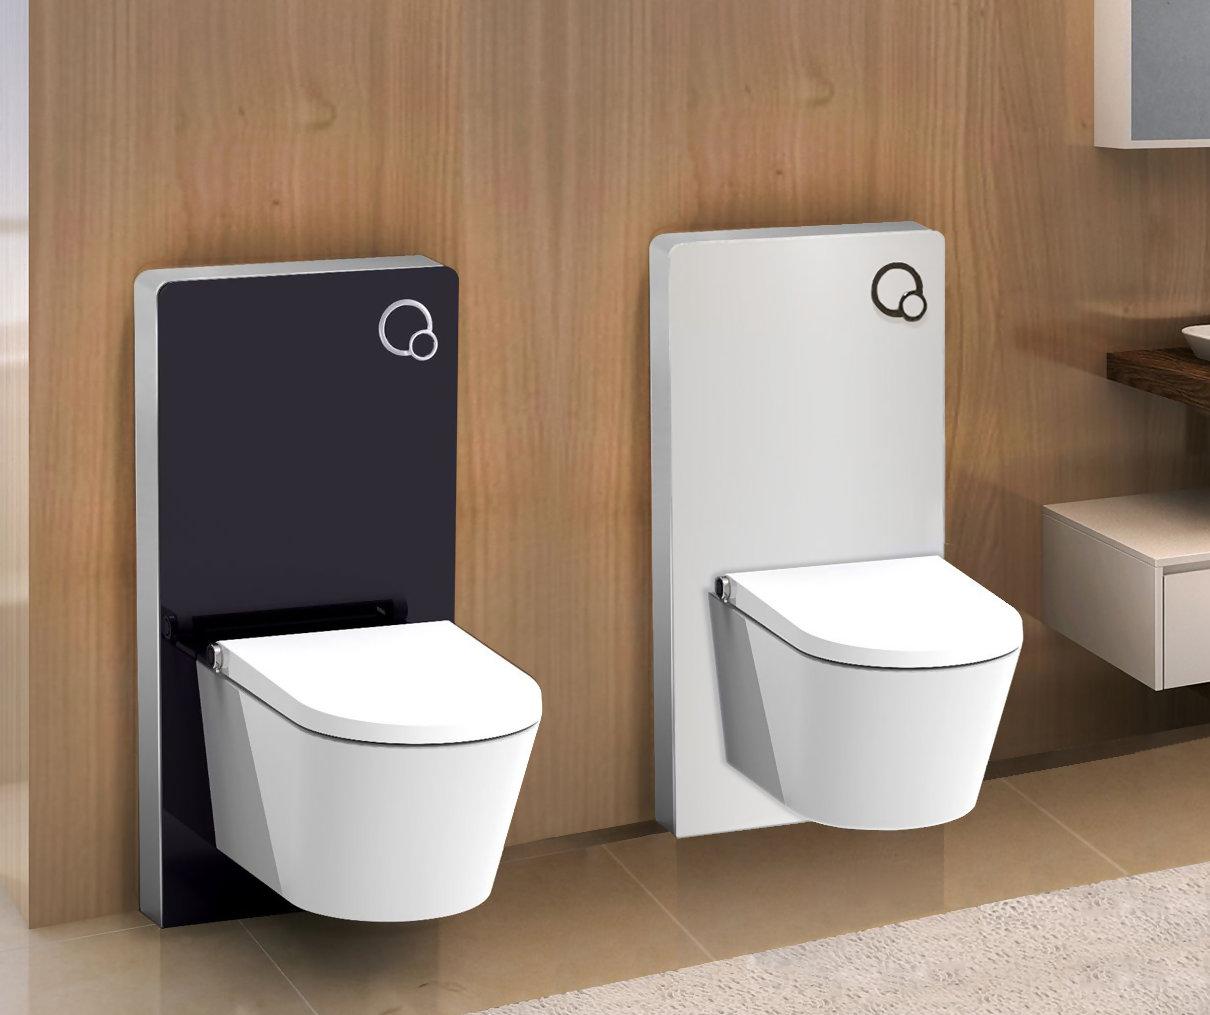 glas sanit rmodul f r wand wc vorwandelement sp lkasten montageelement ebay. Black Bedroom Furniture Sets. Home Design Ideas